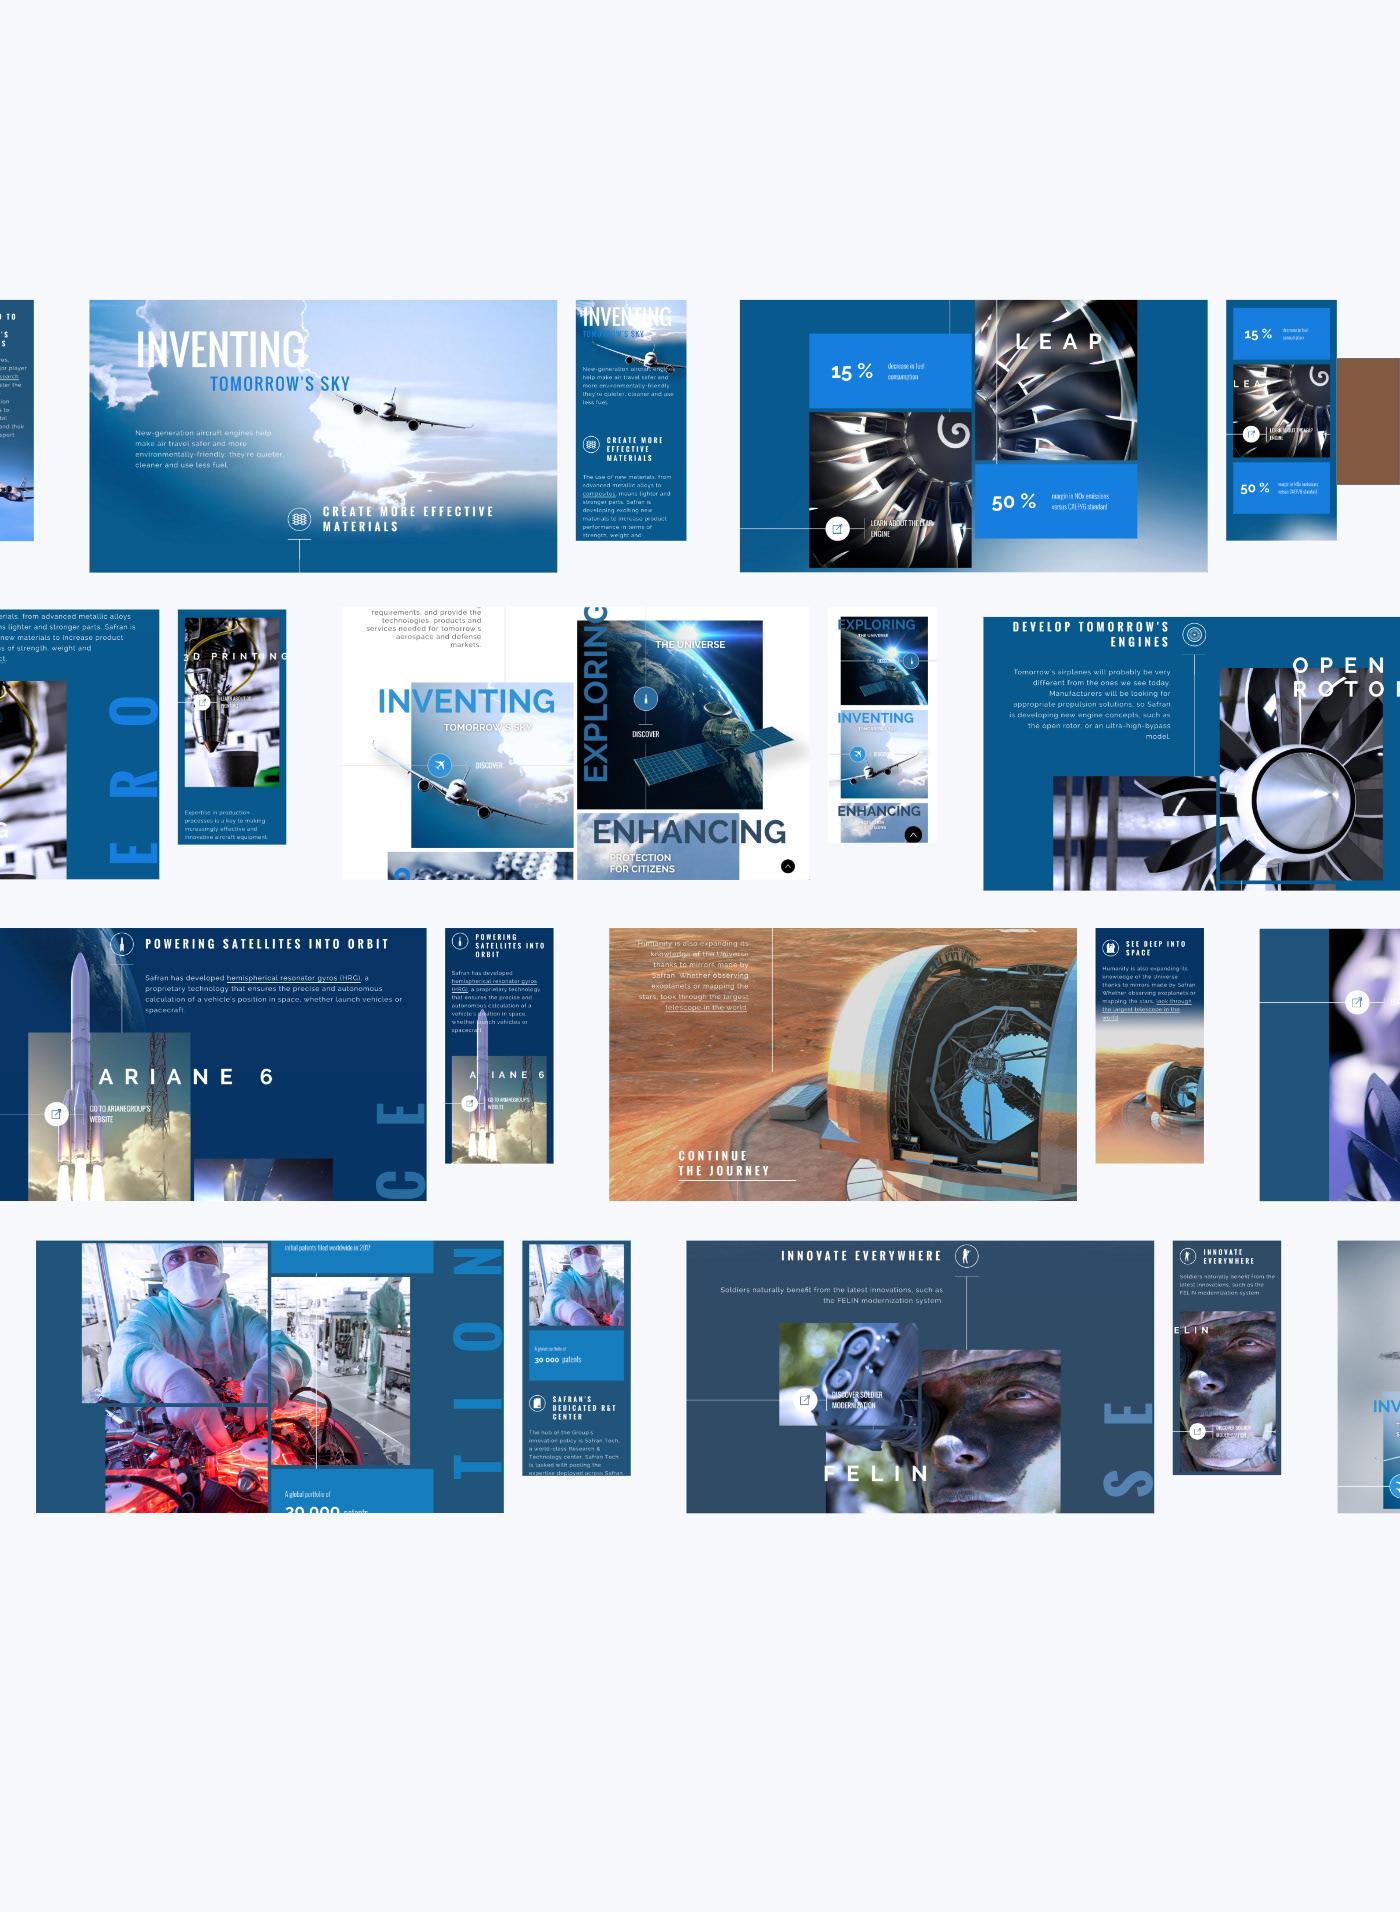 UX / UI,Aerospace,corporate,Web,parallax,industry,Ariane,storytelling  ,satellite,leap engine